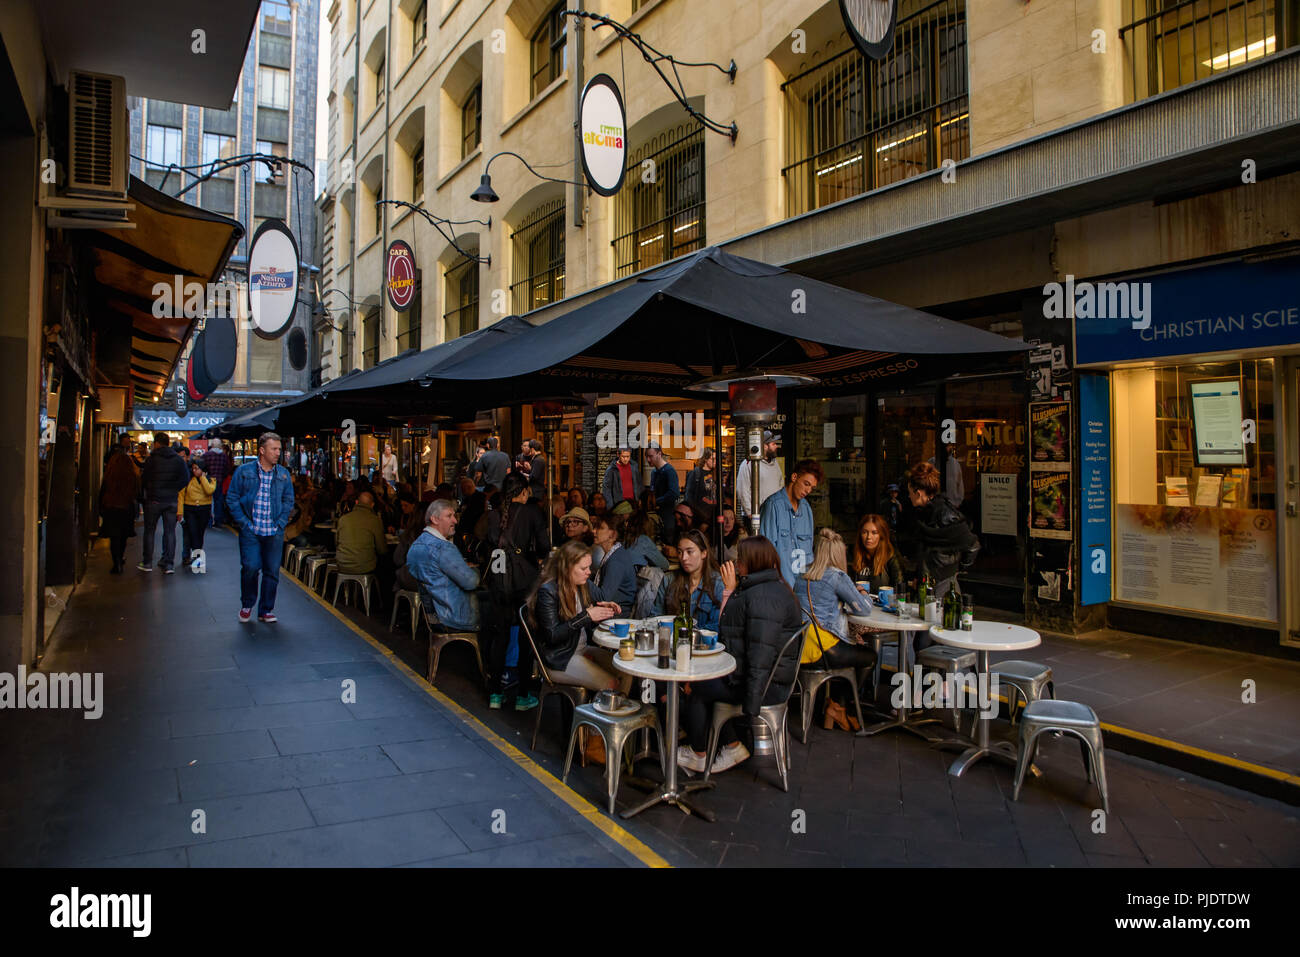 christian cafe australia